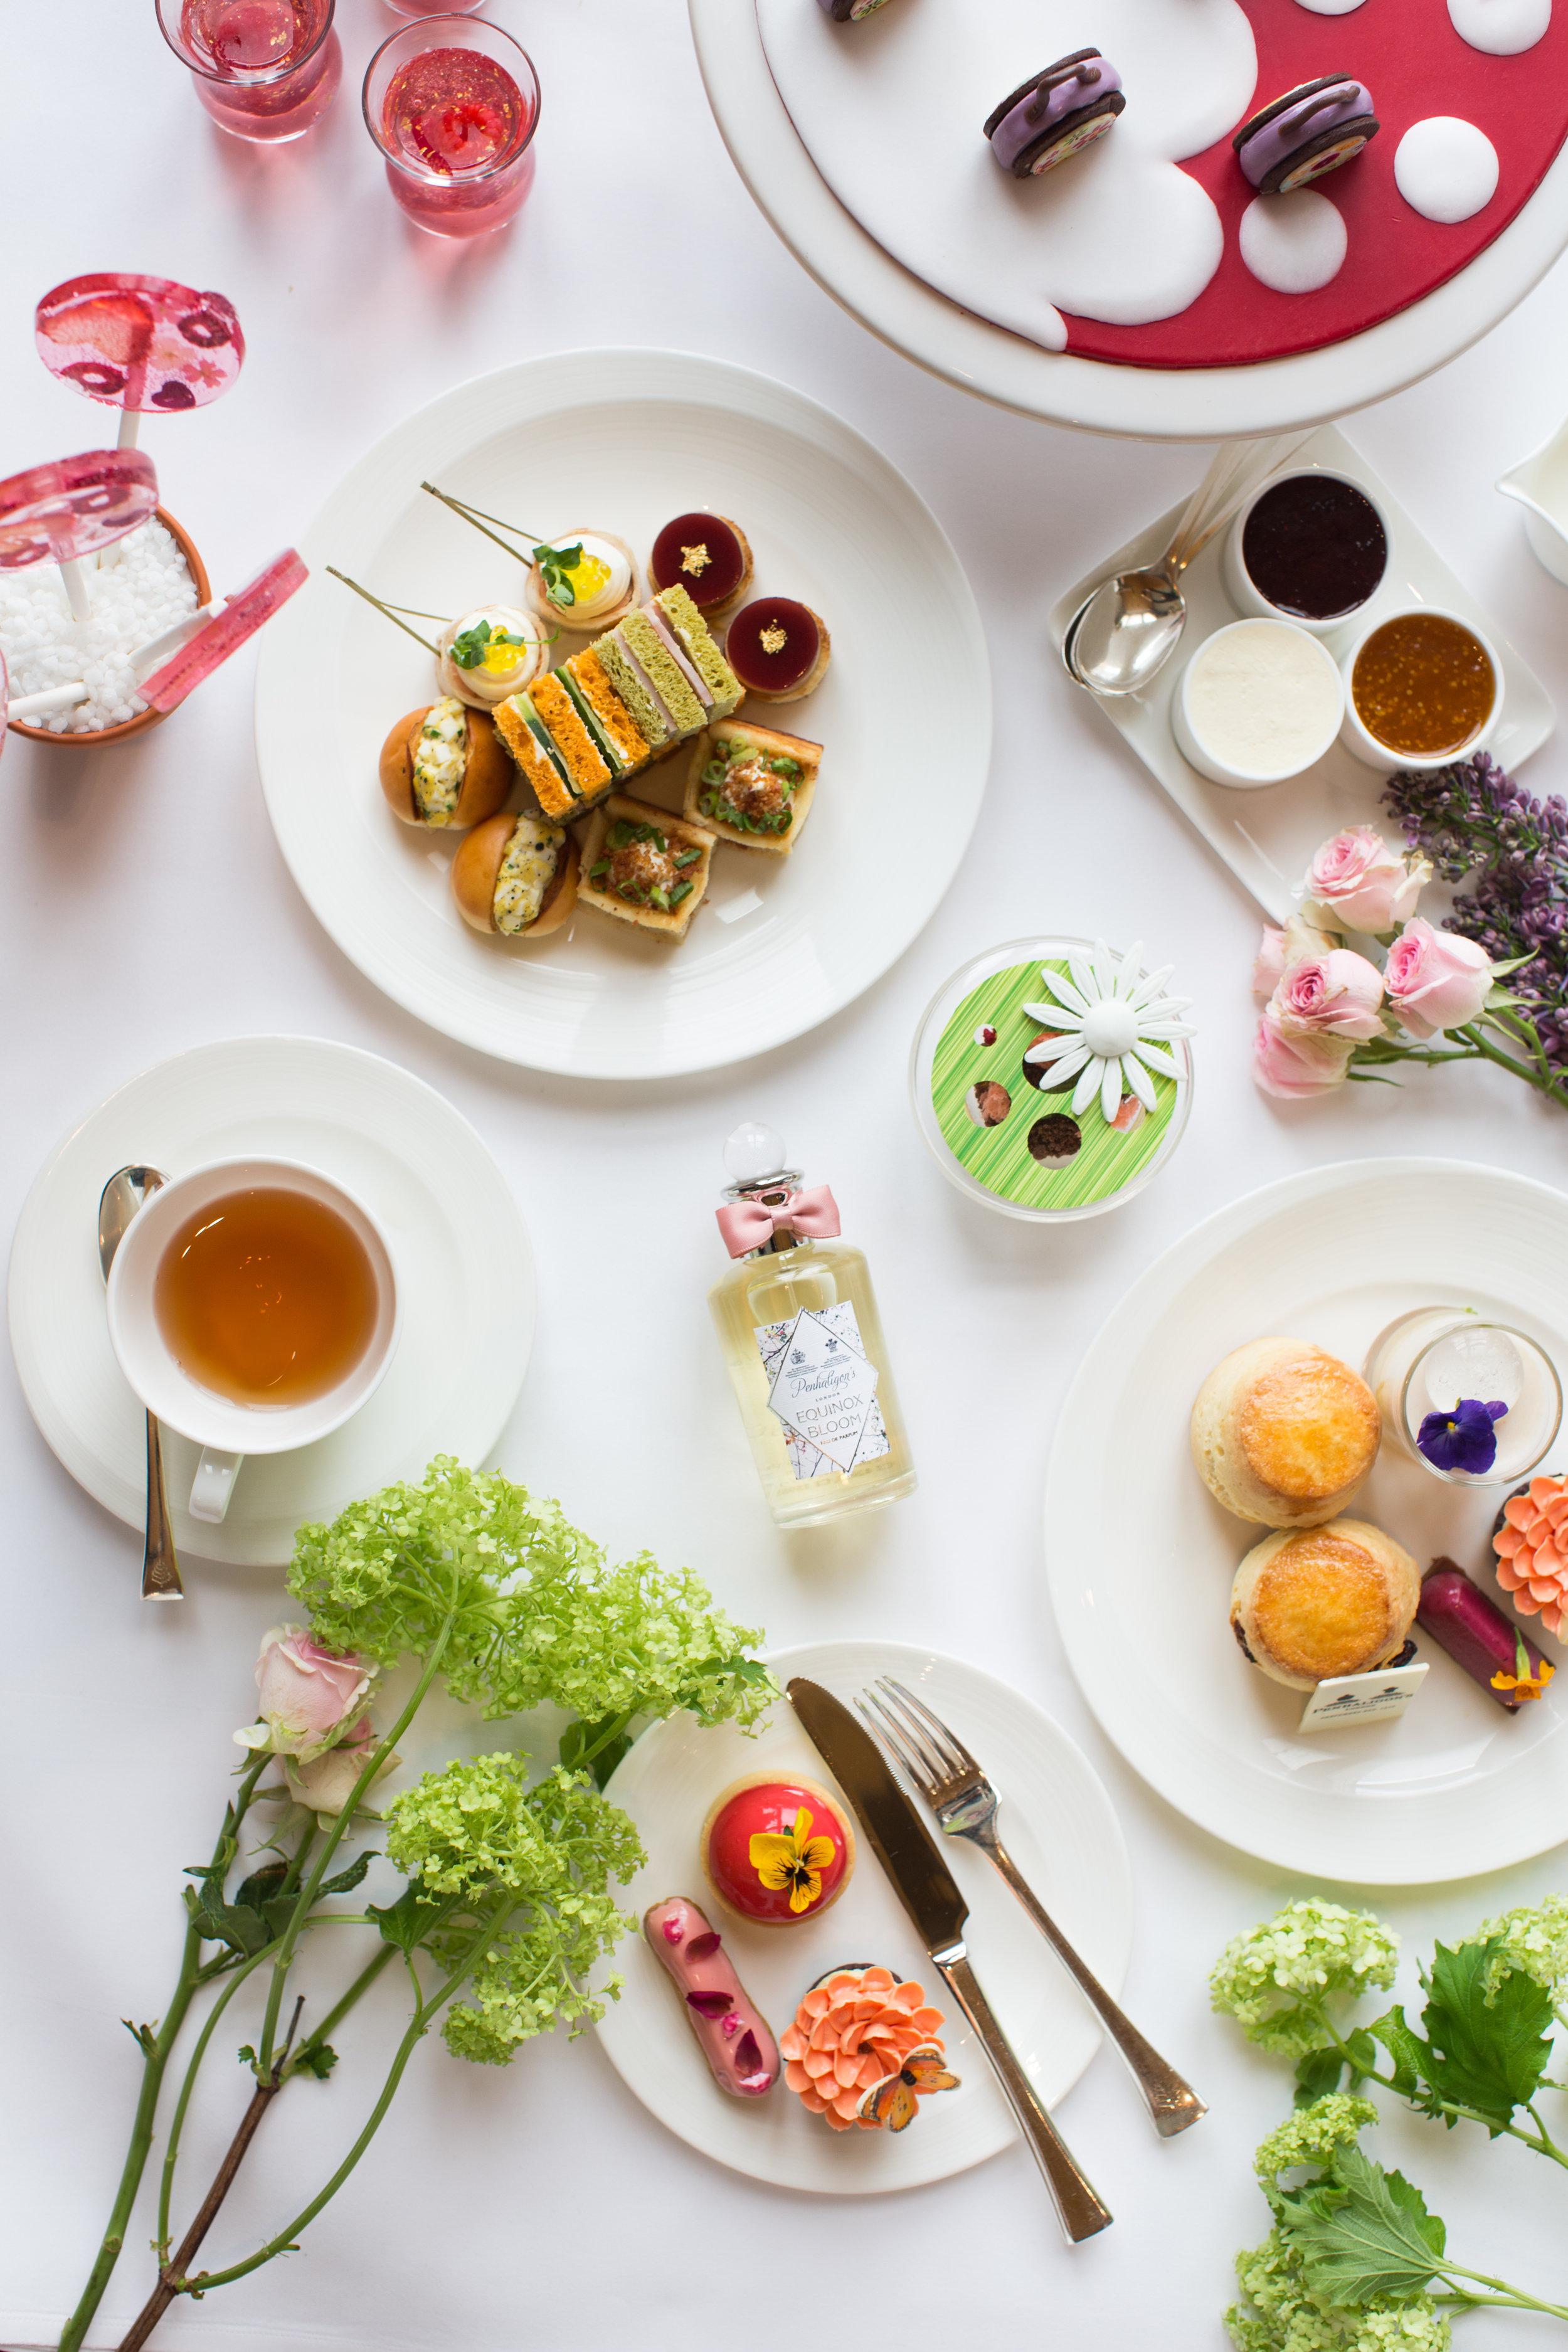 four-seasons-afternoon-tea-11.jpg